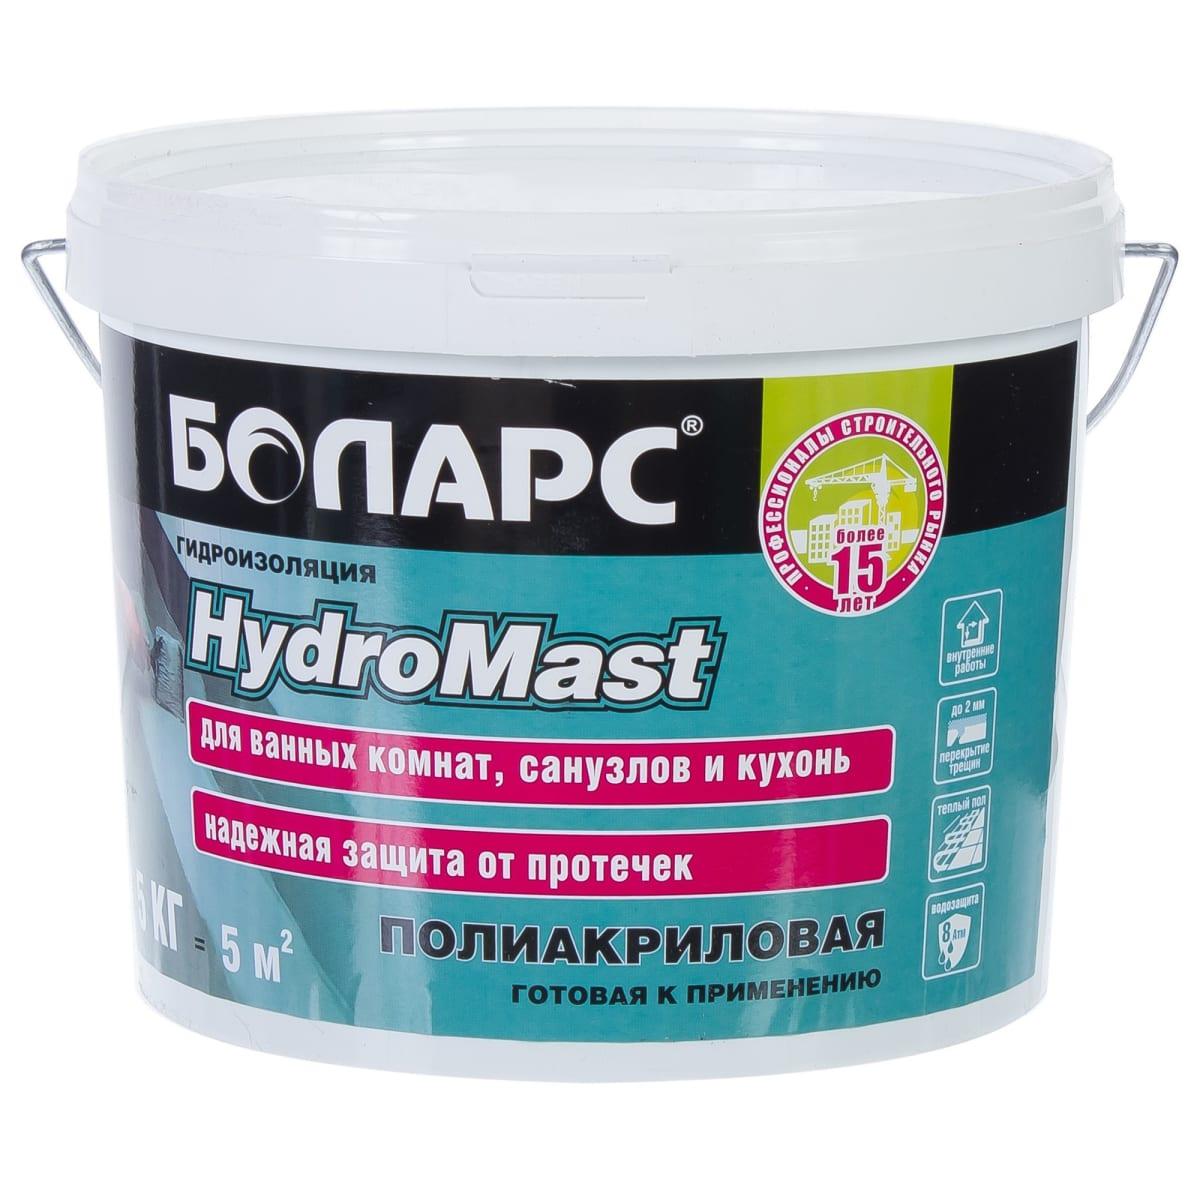 Гидроизоляция полиакриловая Боларс Hydromast (синяя), 5 кг